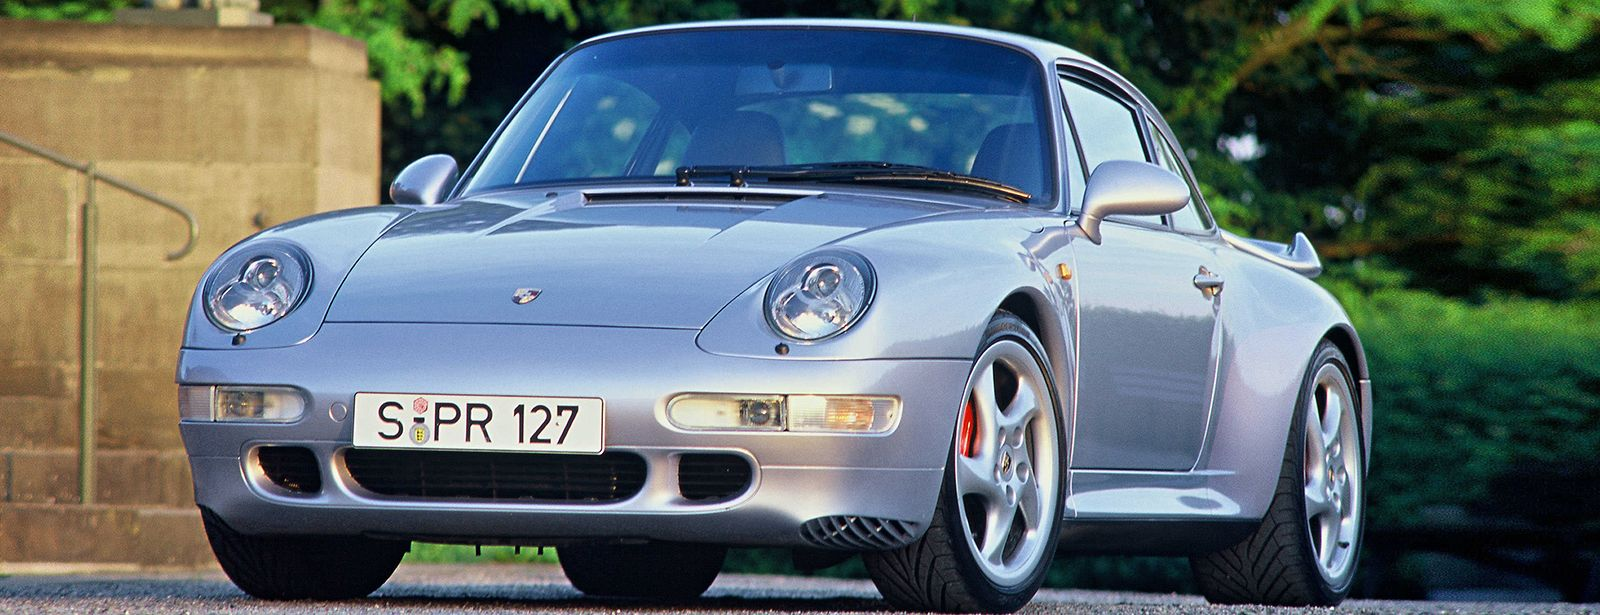 Porsche 993 911 Turbo 1995-1998